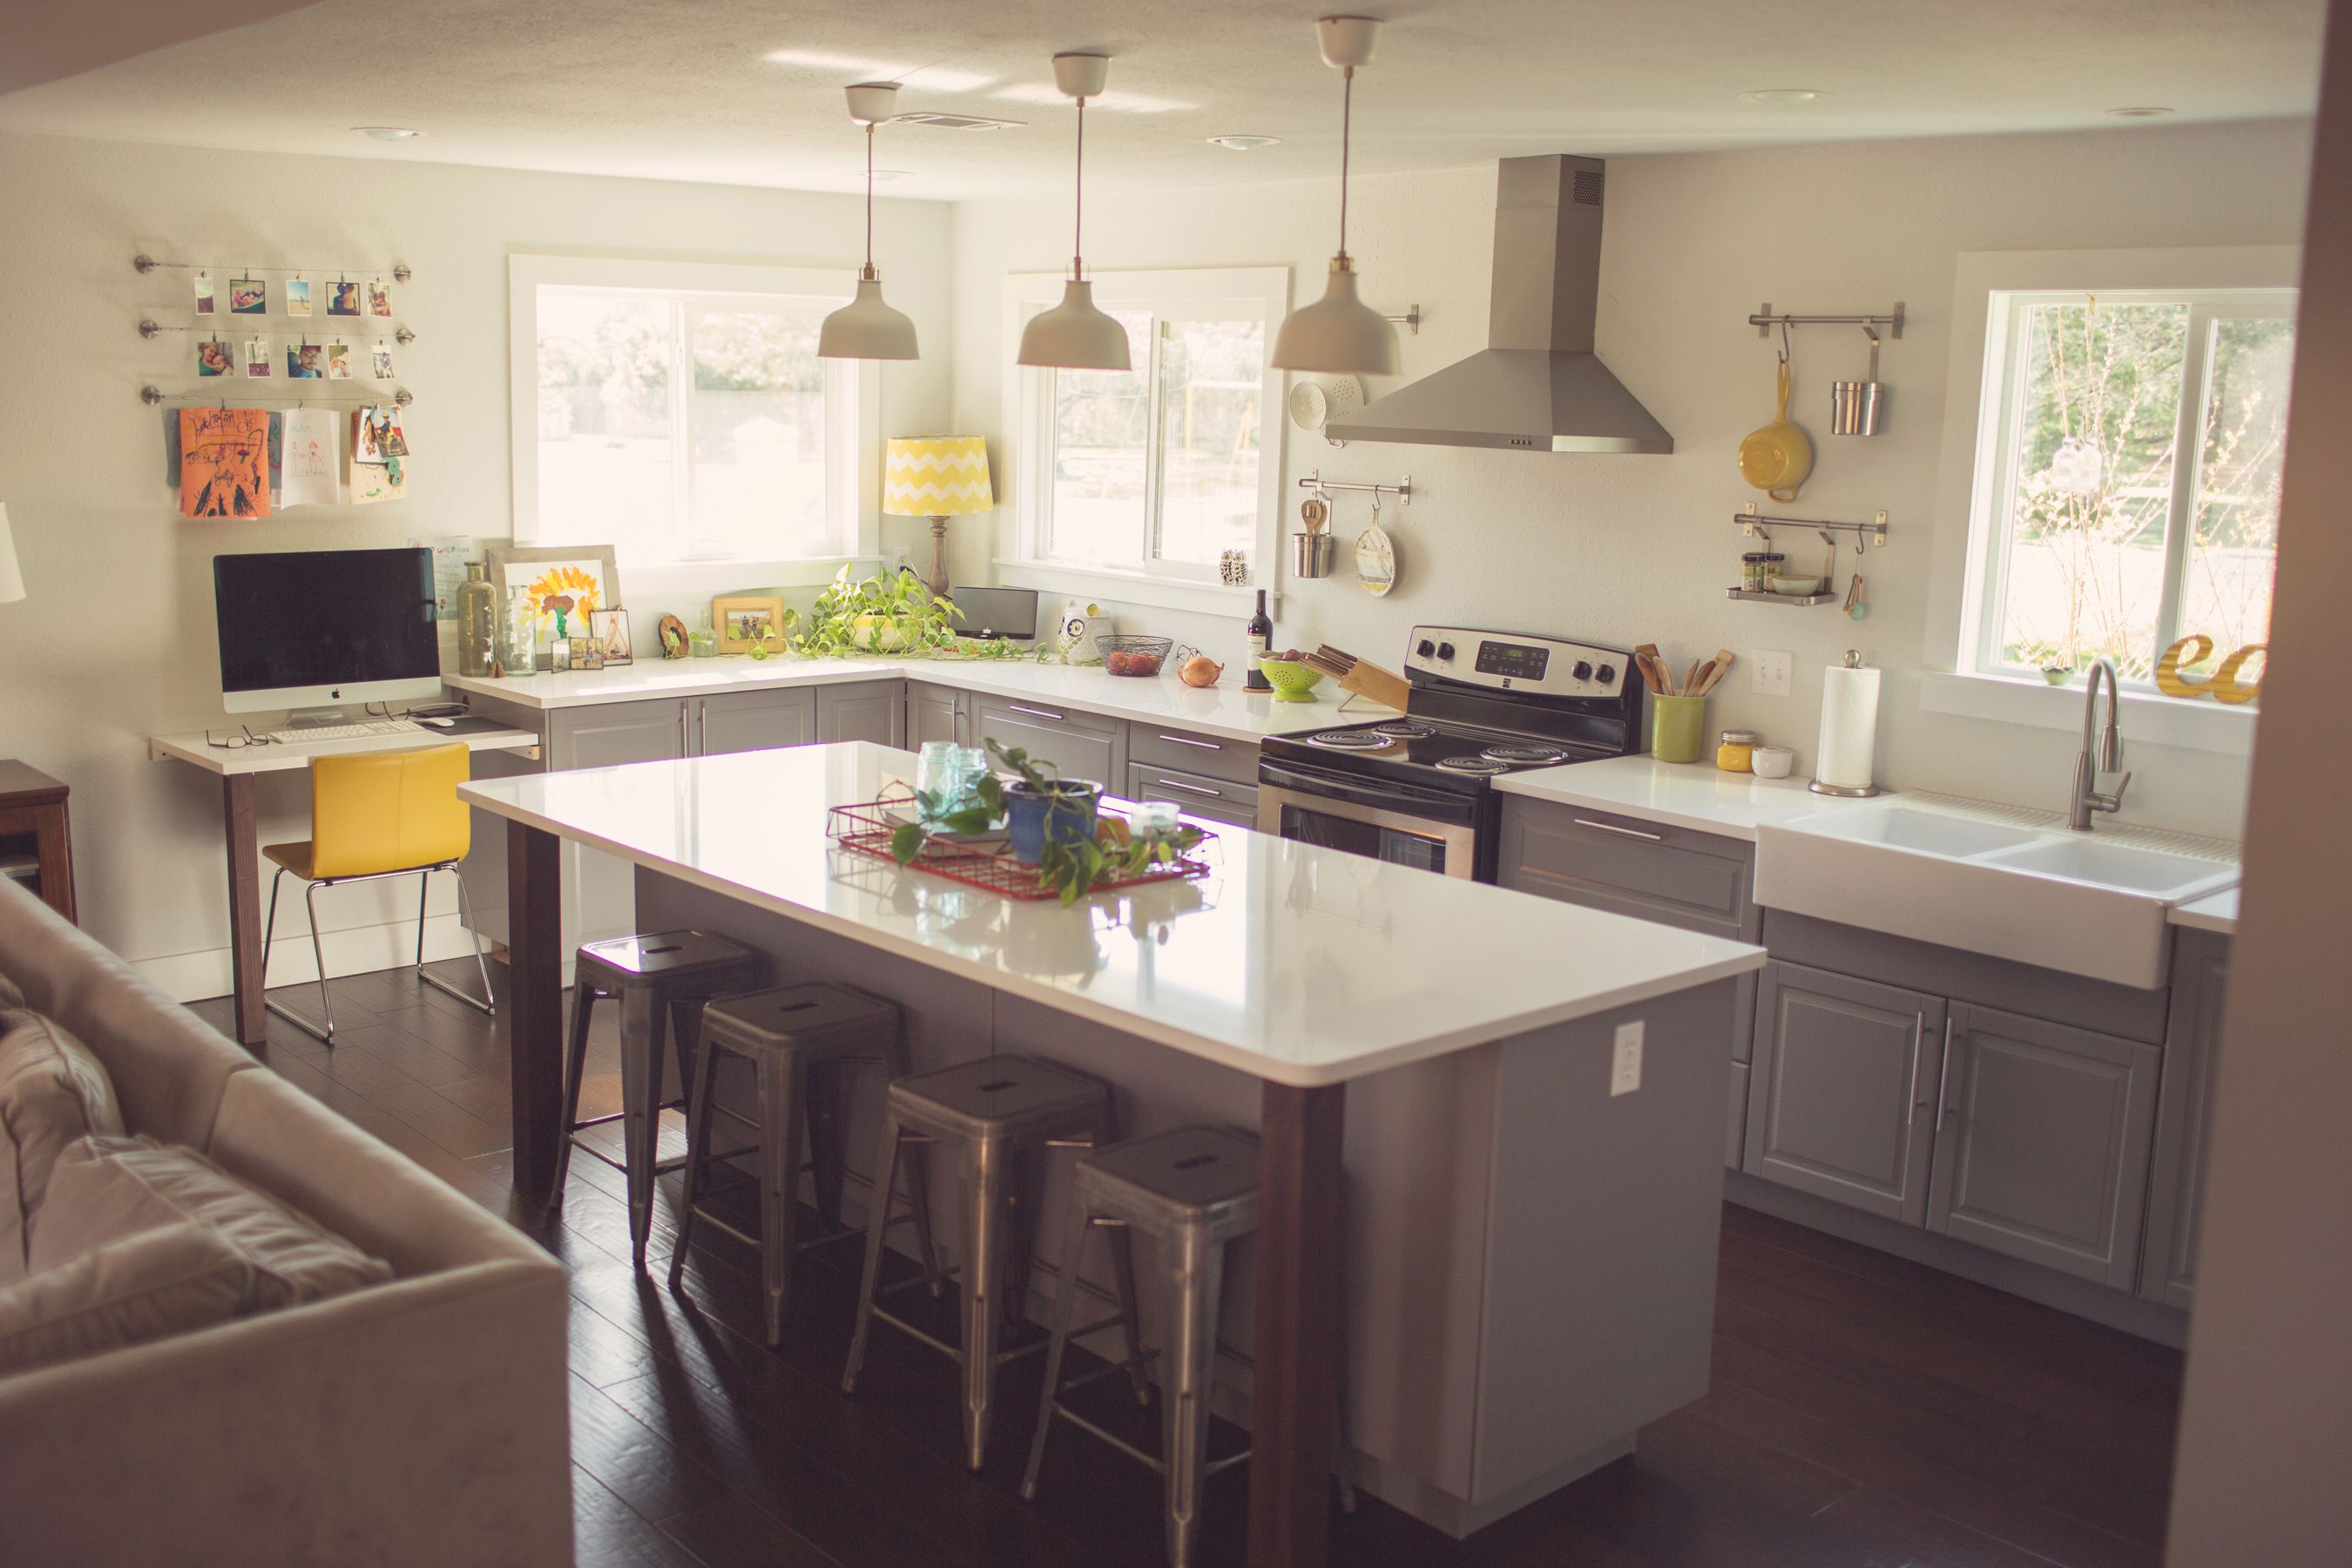 Modern kitchen with snow white quartz counter long peninsula and white - White Zeus Extreme Silestone Quartz Countertop In A Modern Farmhouse Styled Kitchen With Yellow Accents And